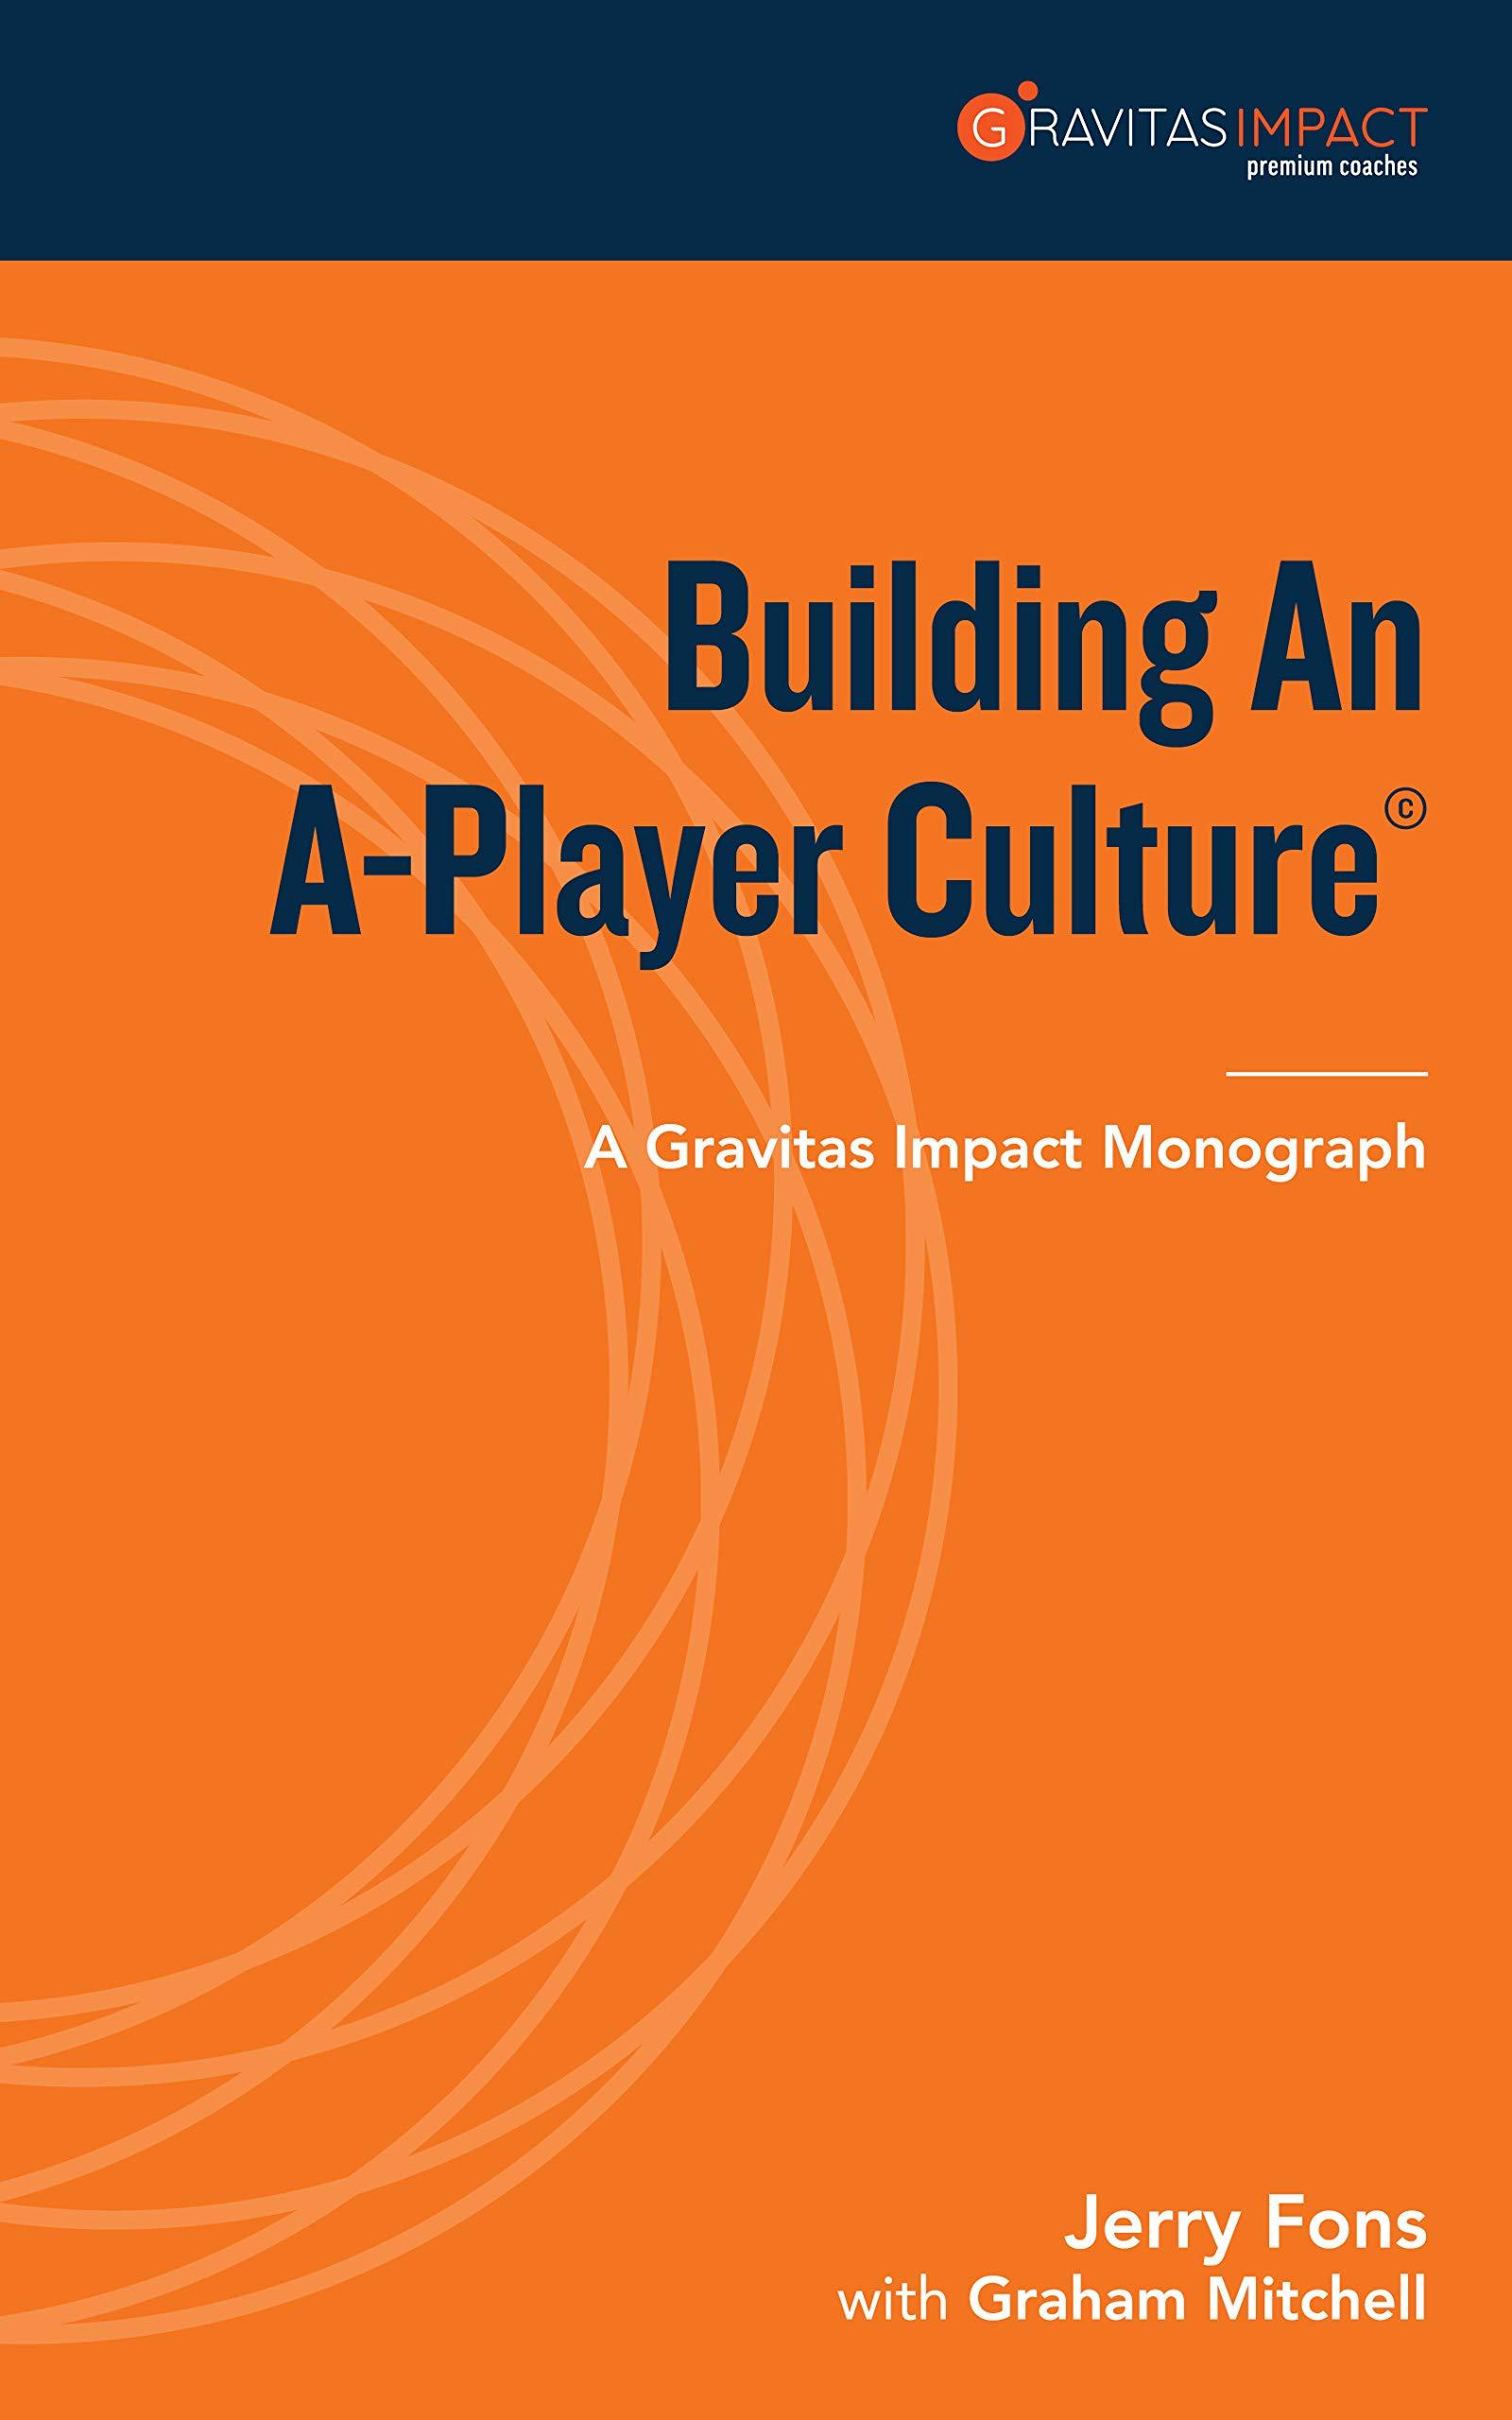 Building An A-Player Culture: A Gravitas Impact Monograph (Gravitas Impact Monographs: Talent Book 1)